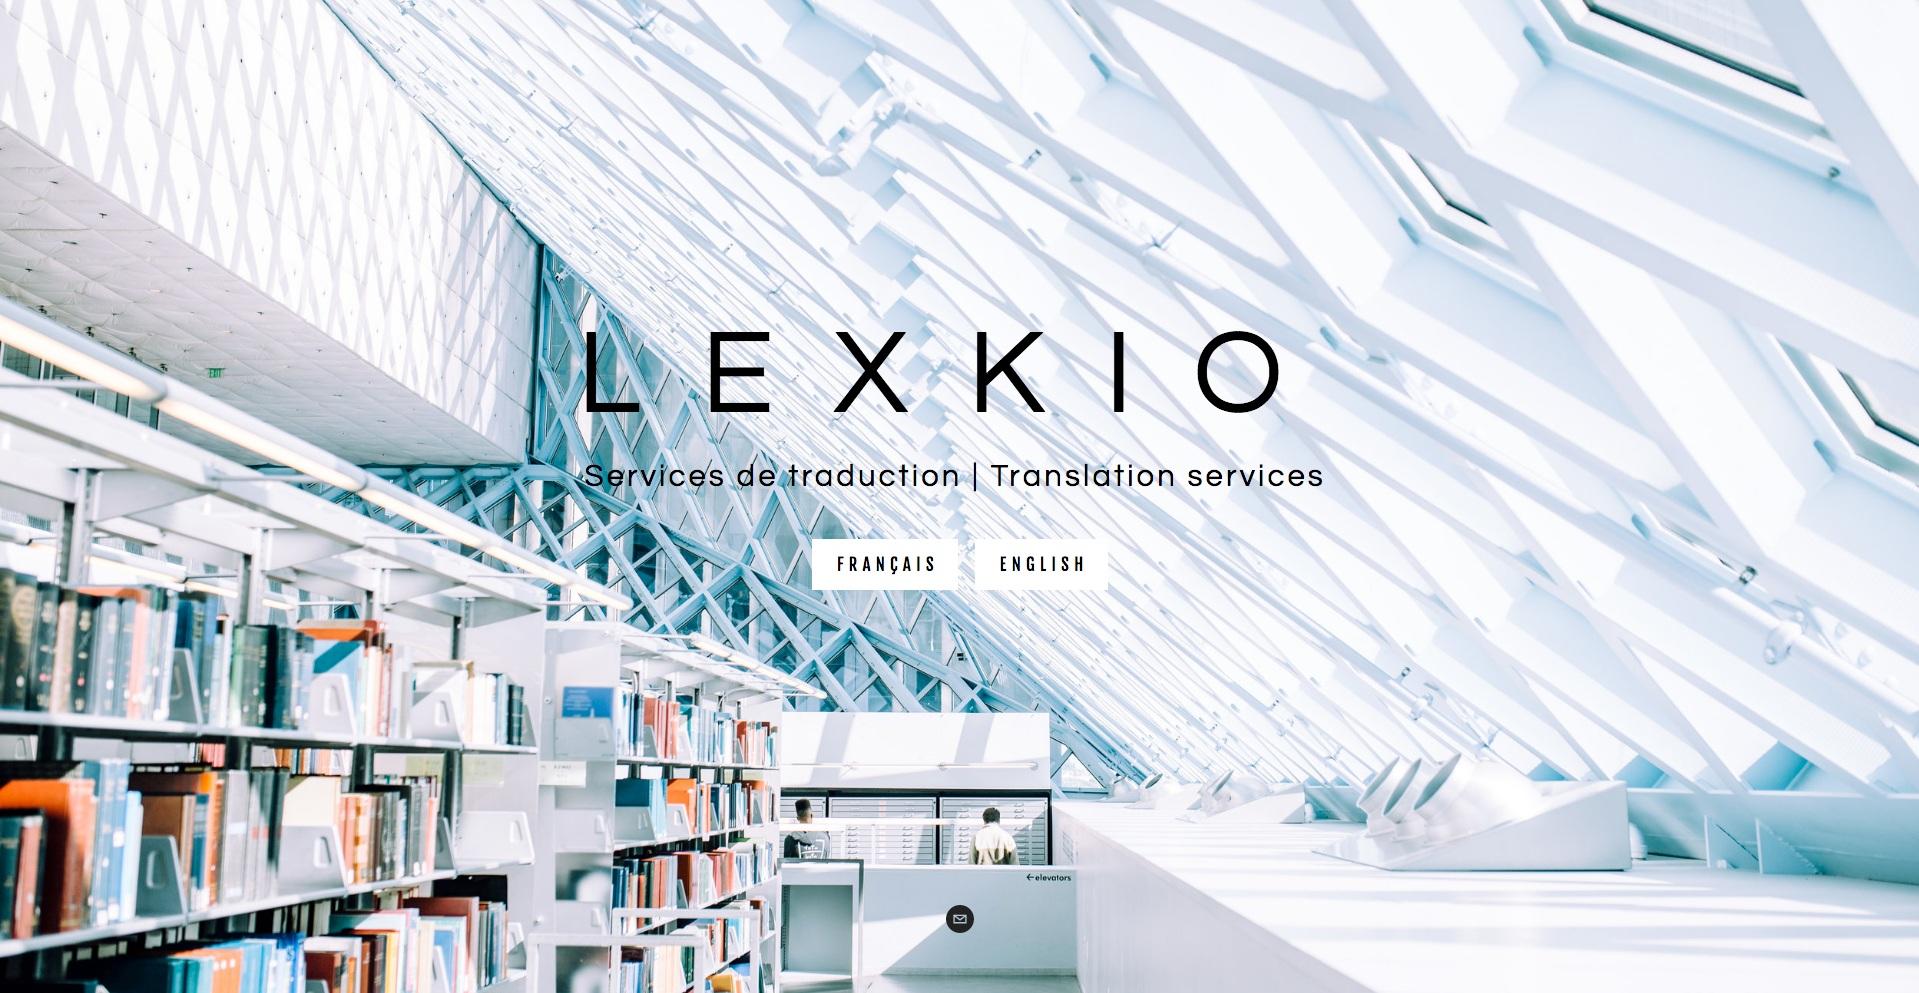 LEXKIO+Translation+Services.jpg